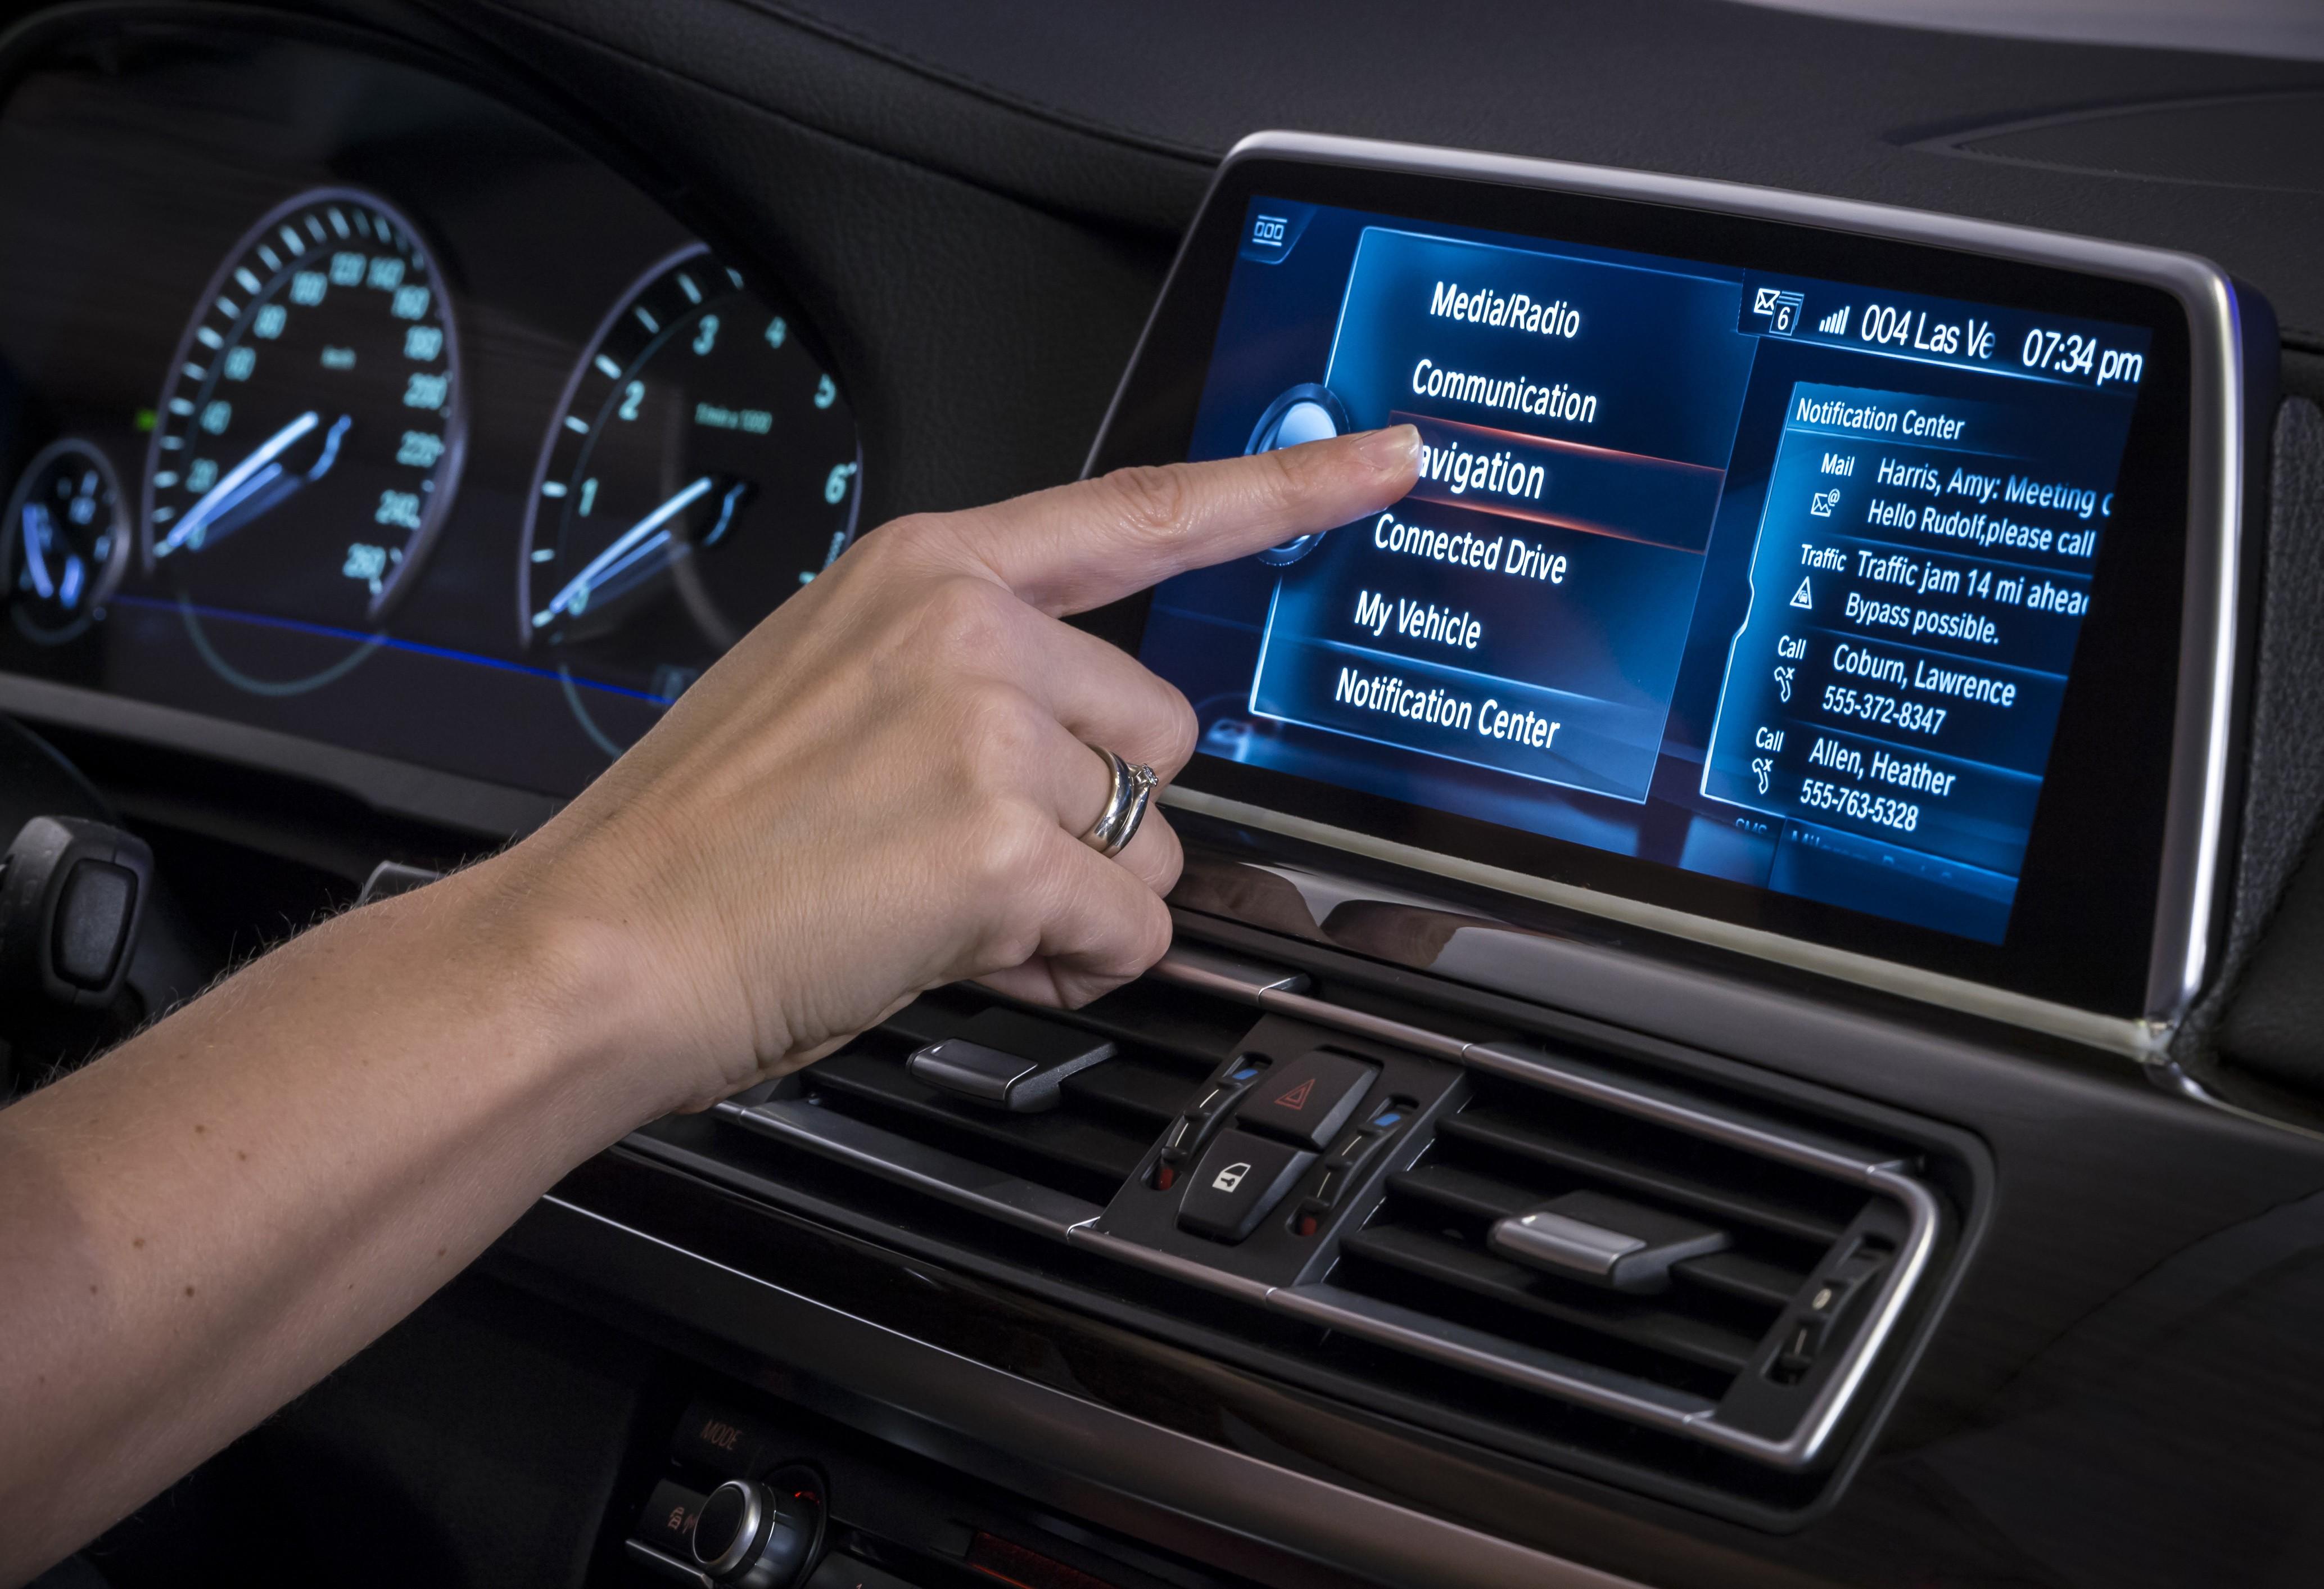 bmw gesture control ces idrive gen touchscreen vegas unveiled display system a6 bild neues modell c8 autoevolution reveals gtspirit werk